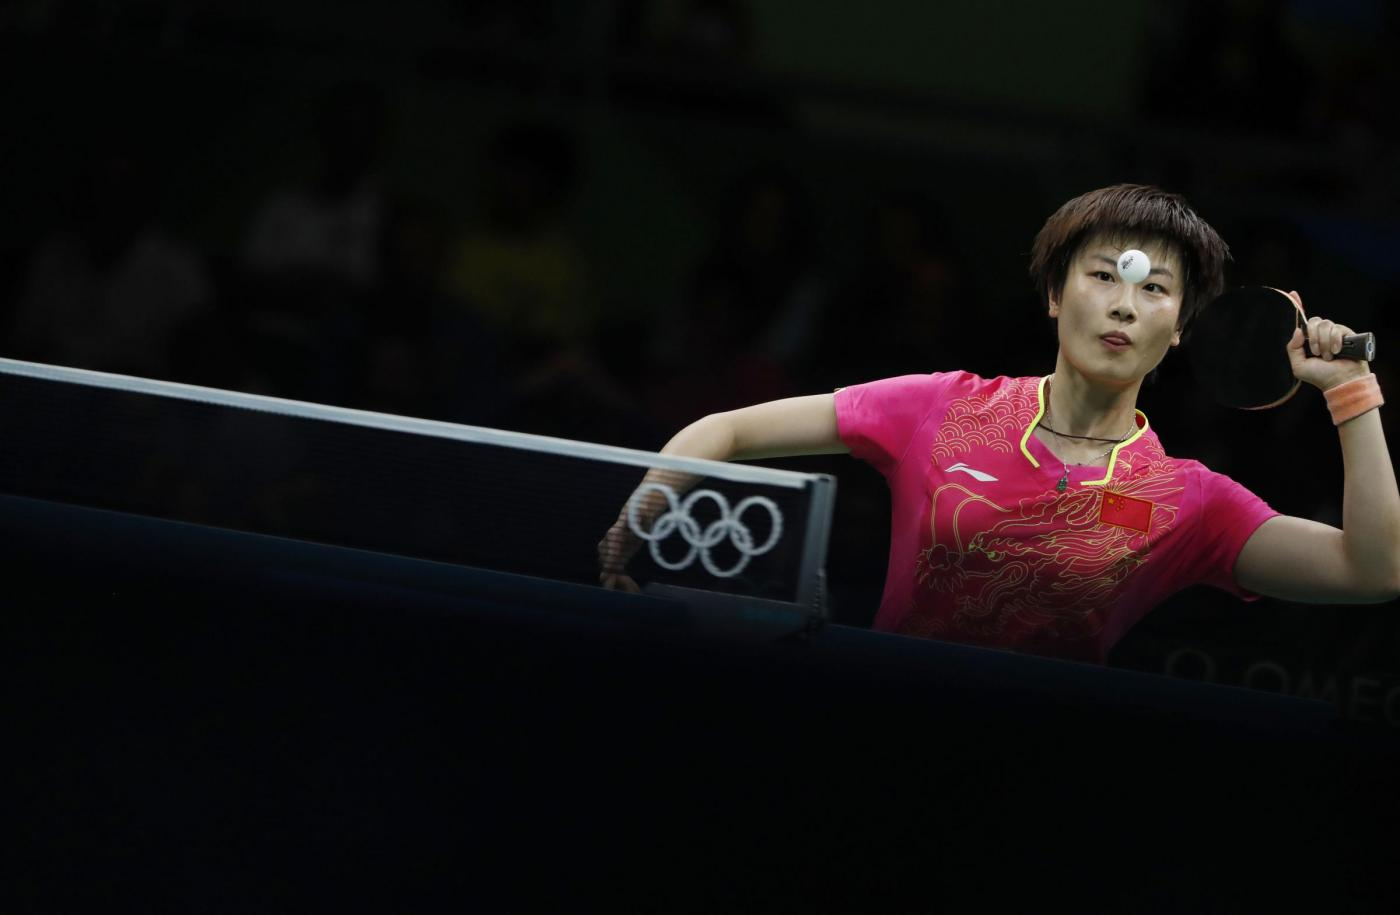 Rio 2016 ping pong : singolare maschile e femminile